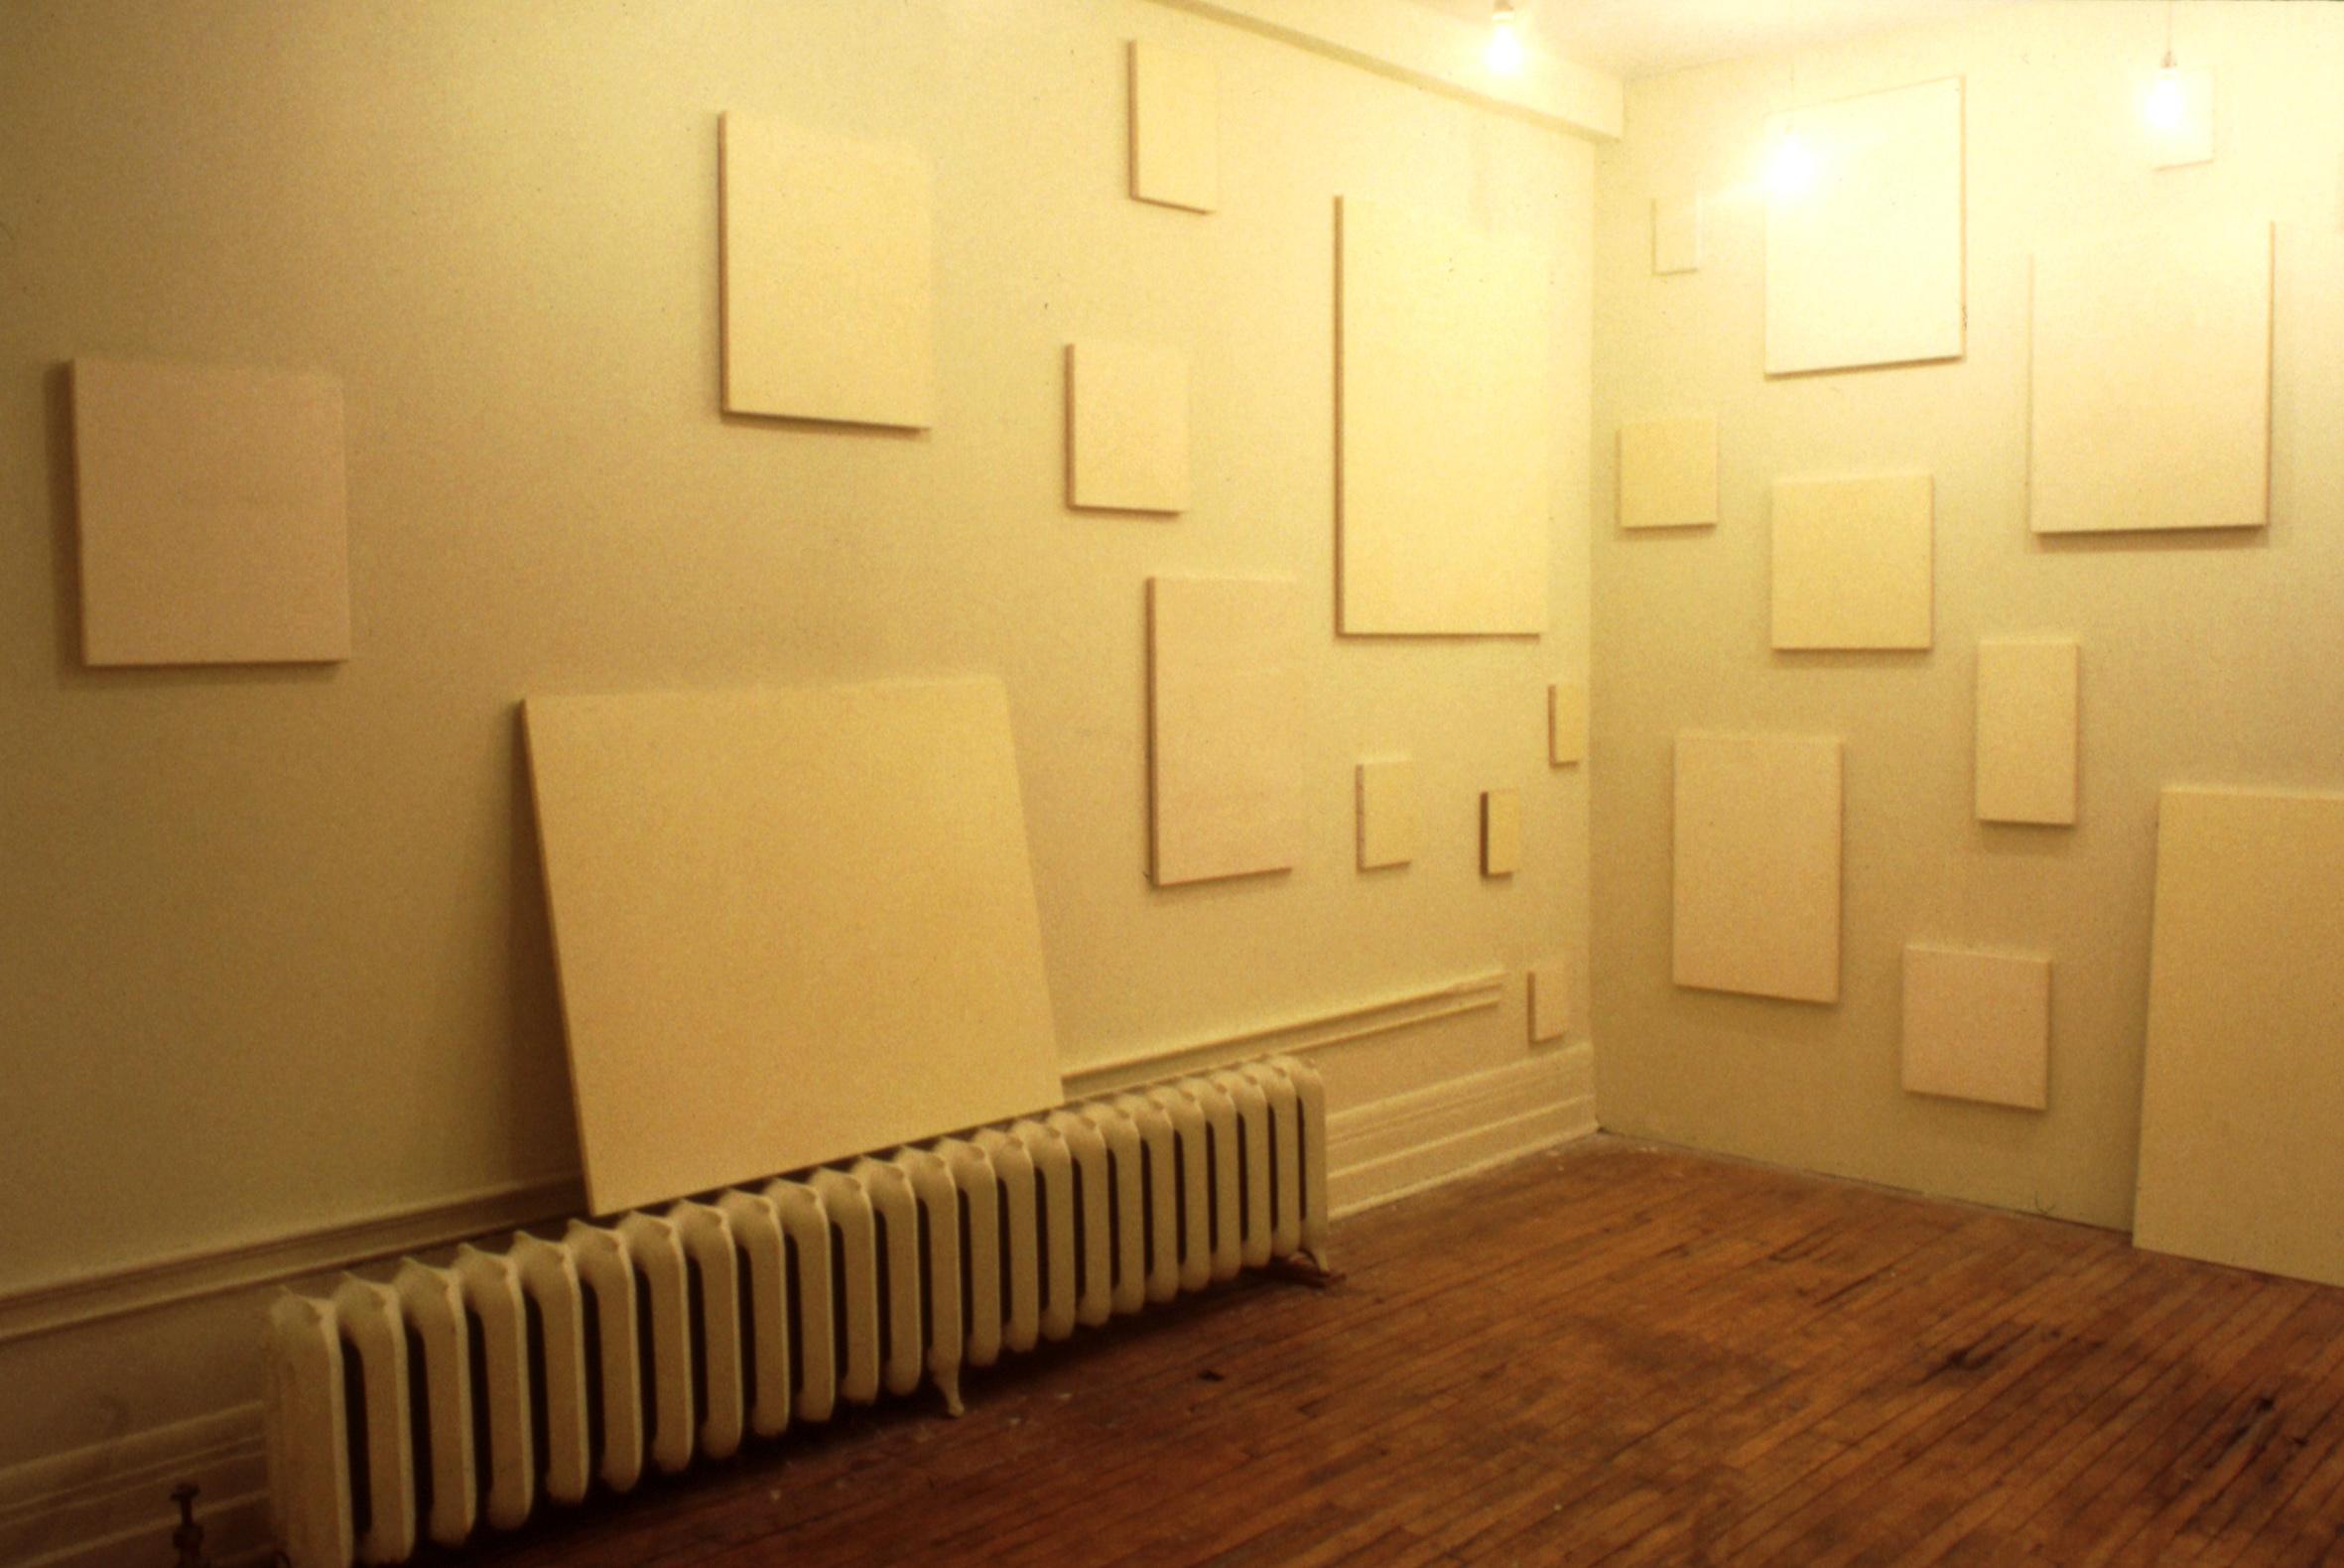 bruneau-pierre-peinture-peinture-assemblee-lumiere-med